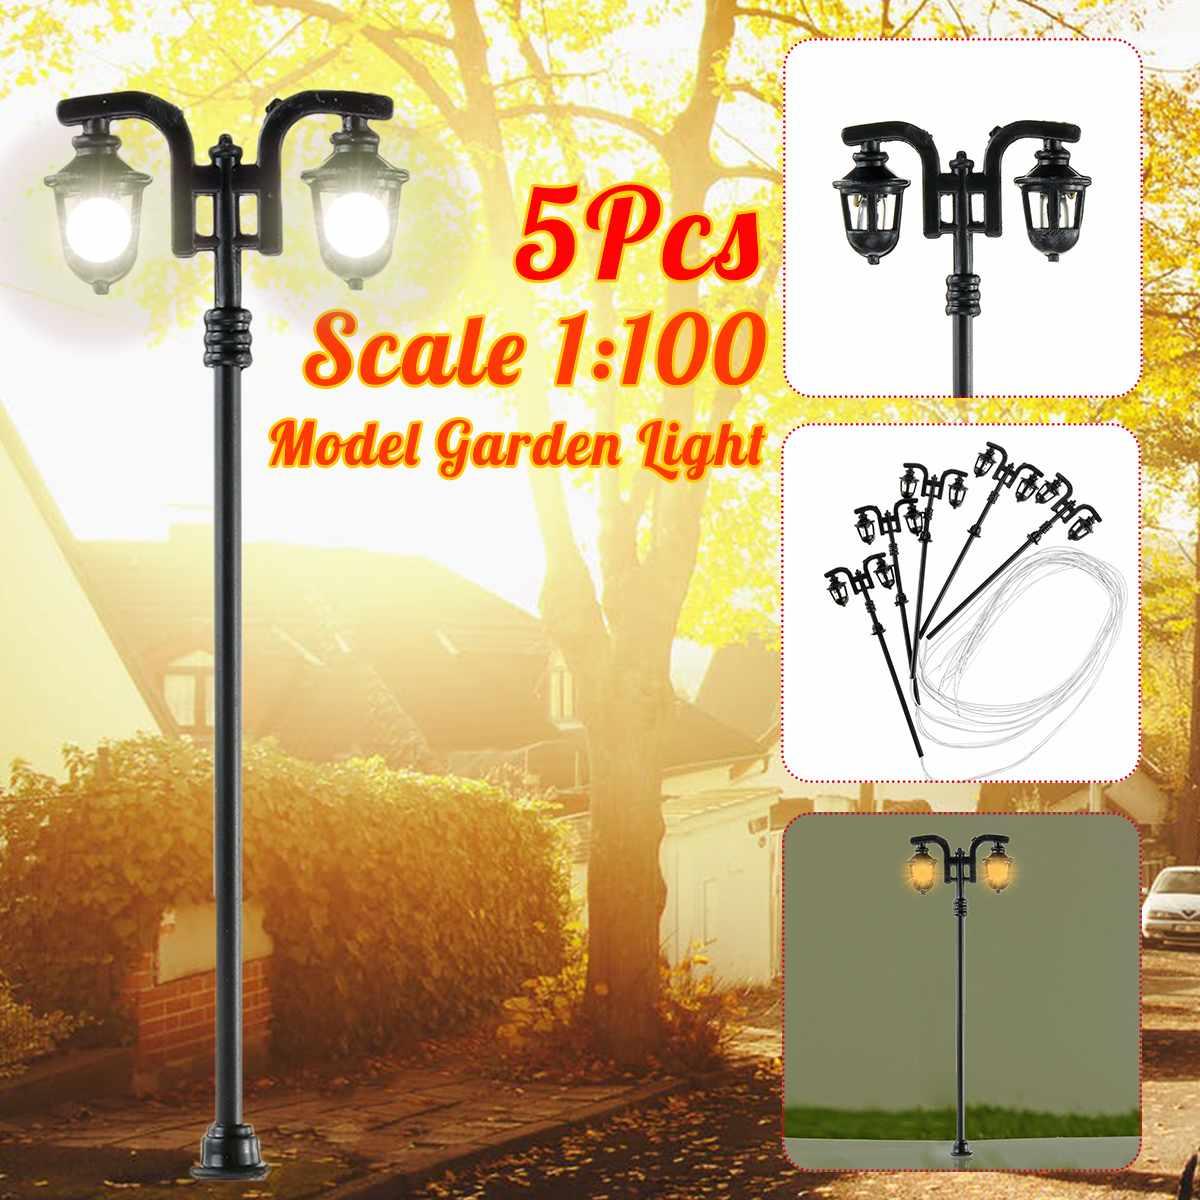 20pcs 1:100 Model Garden Street Light Double Heads Lamppost Mini Railway Train Lamp Micro Landscape Light Model